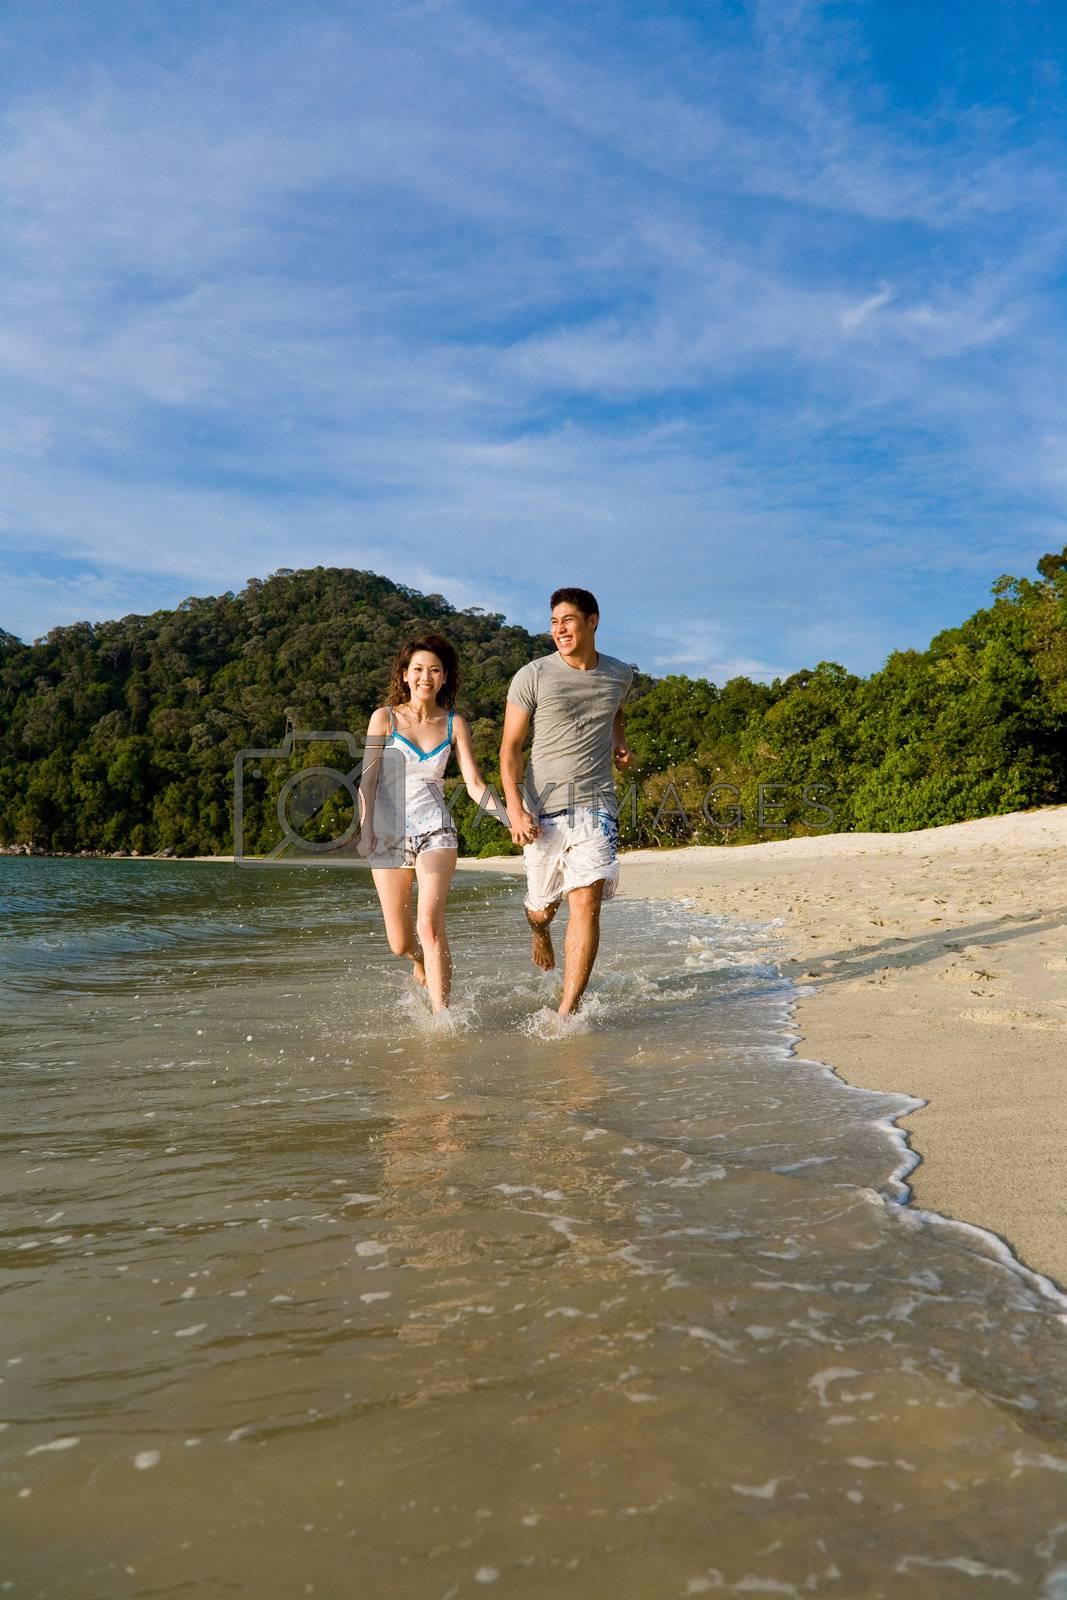 loving couple running along the beach by eyedear